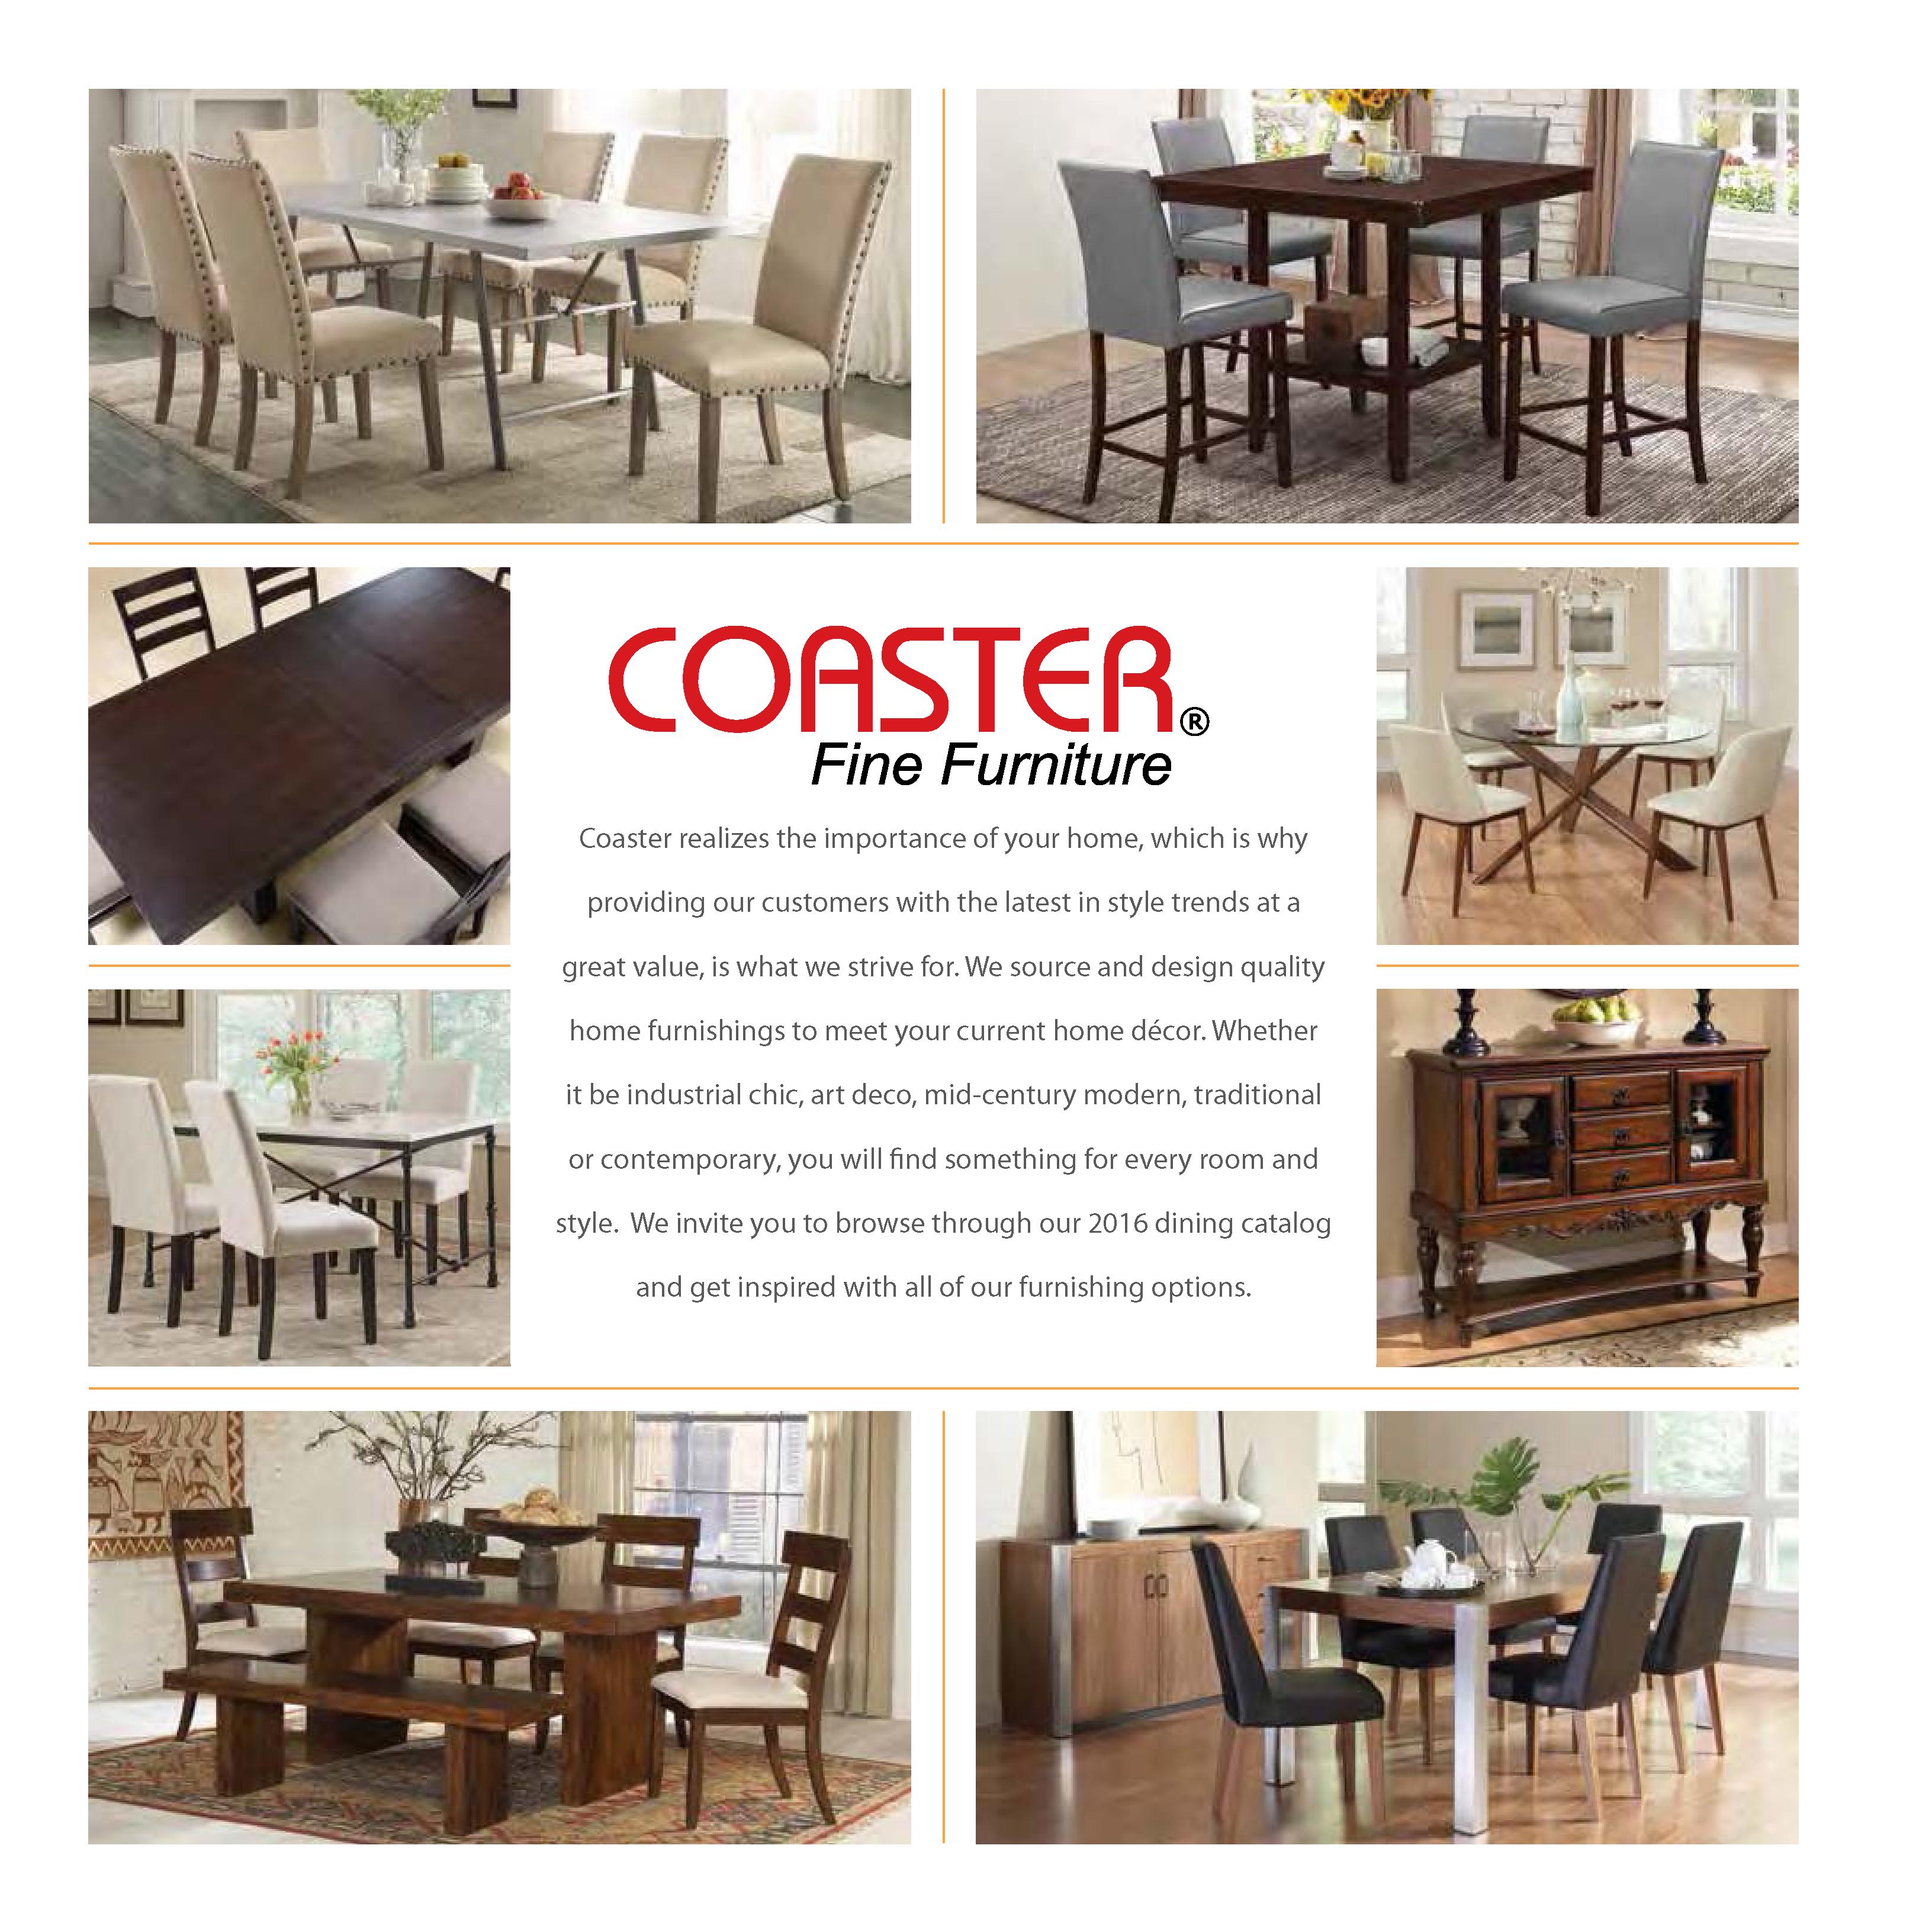 Coaster 2016 Dining Catalog